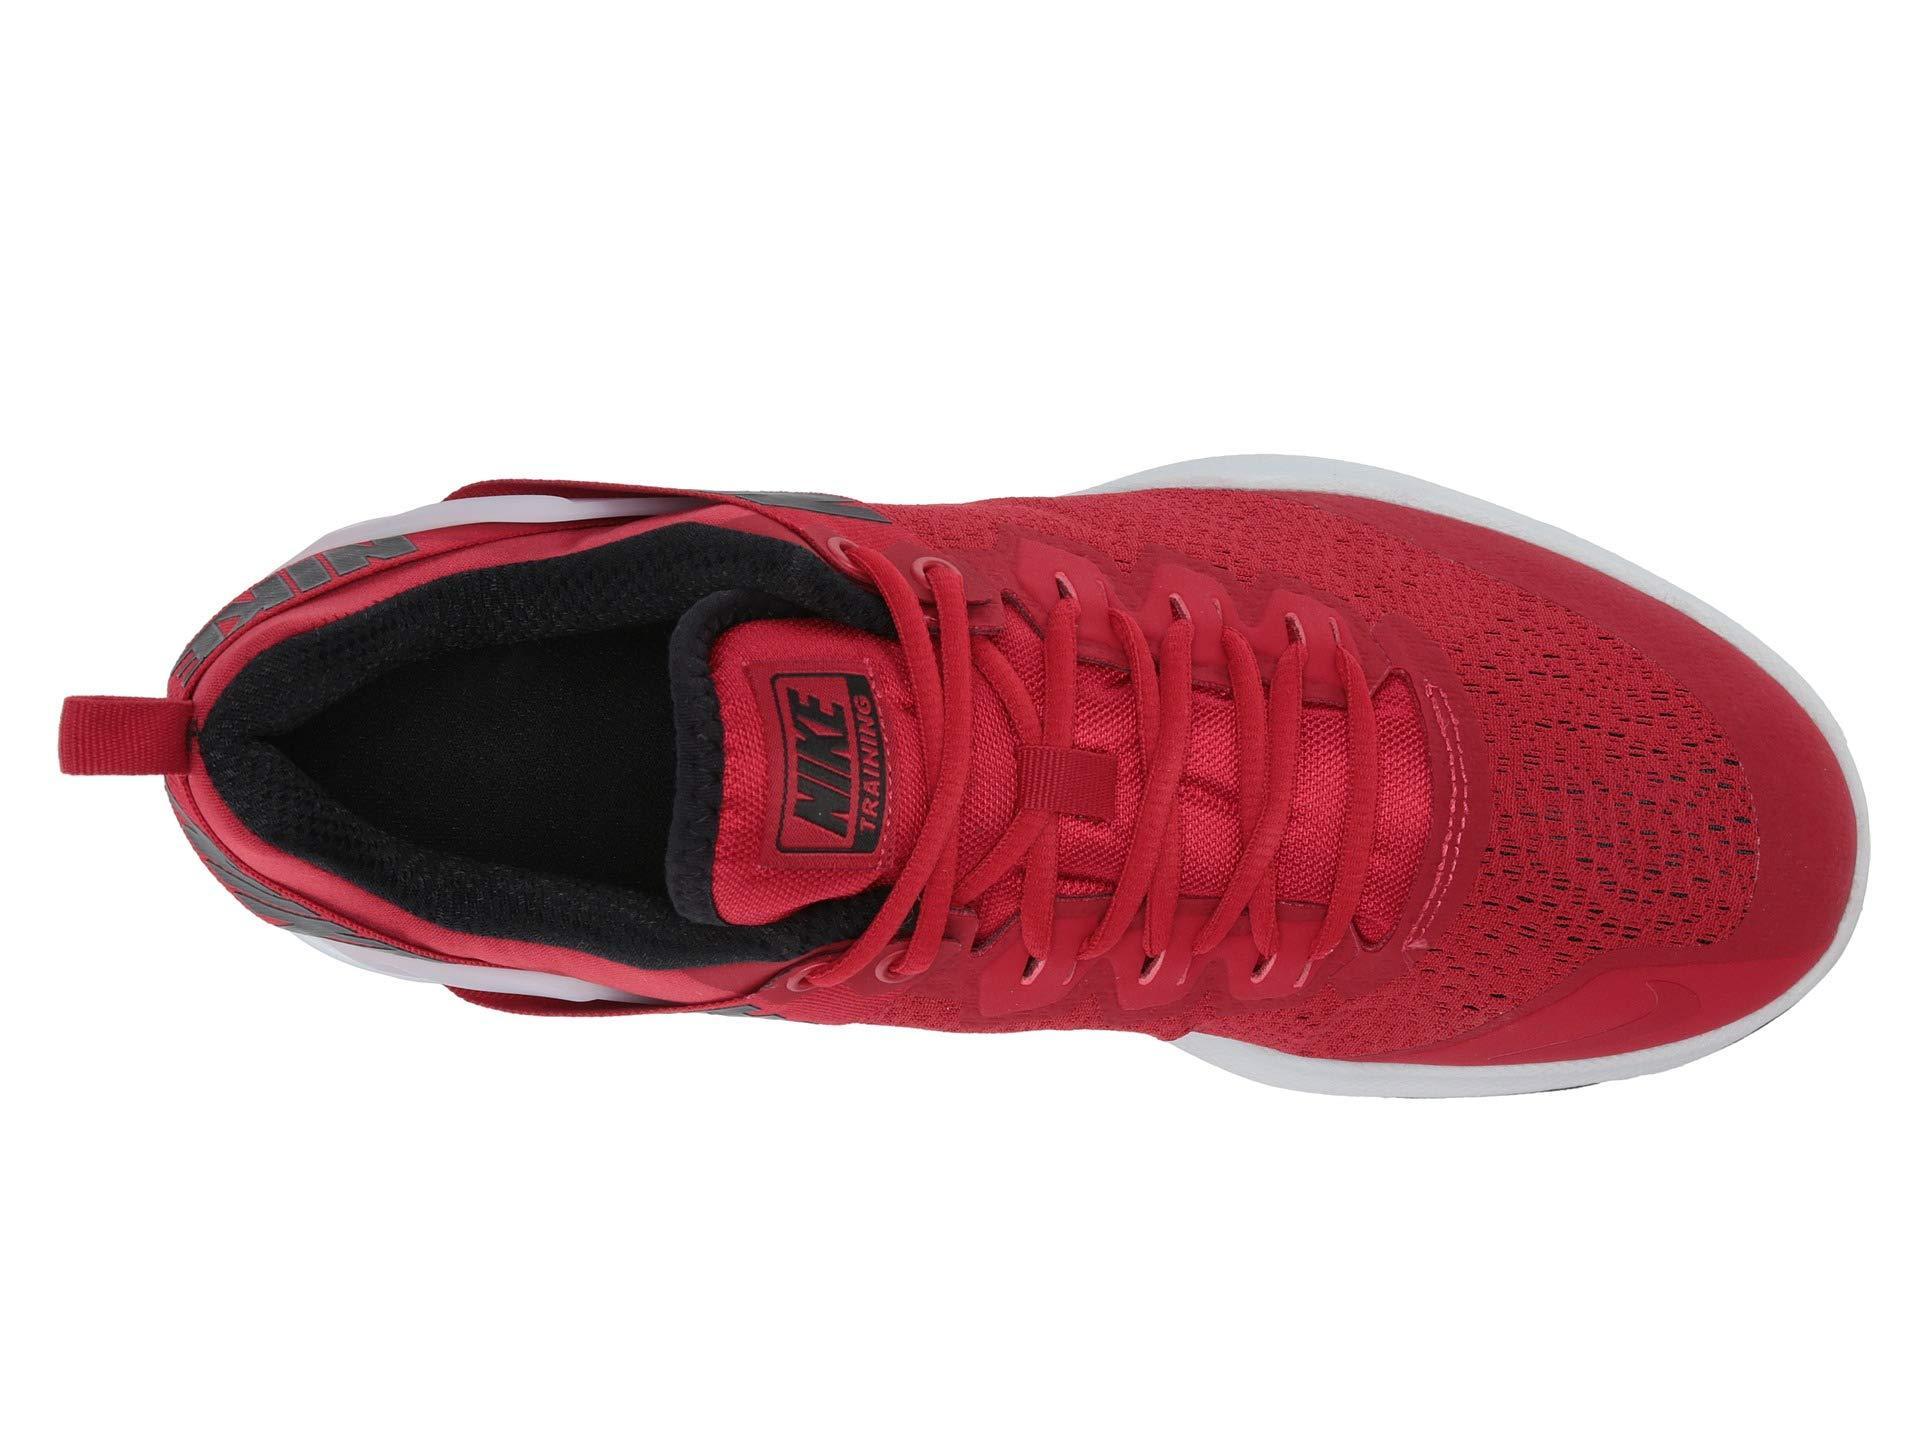 e5b51744677e1 Nike - Red Zoom Domination Tr 2 (black white) Men s Cross Training Shoes.  View fullscreen